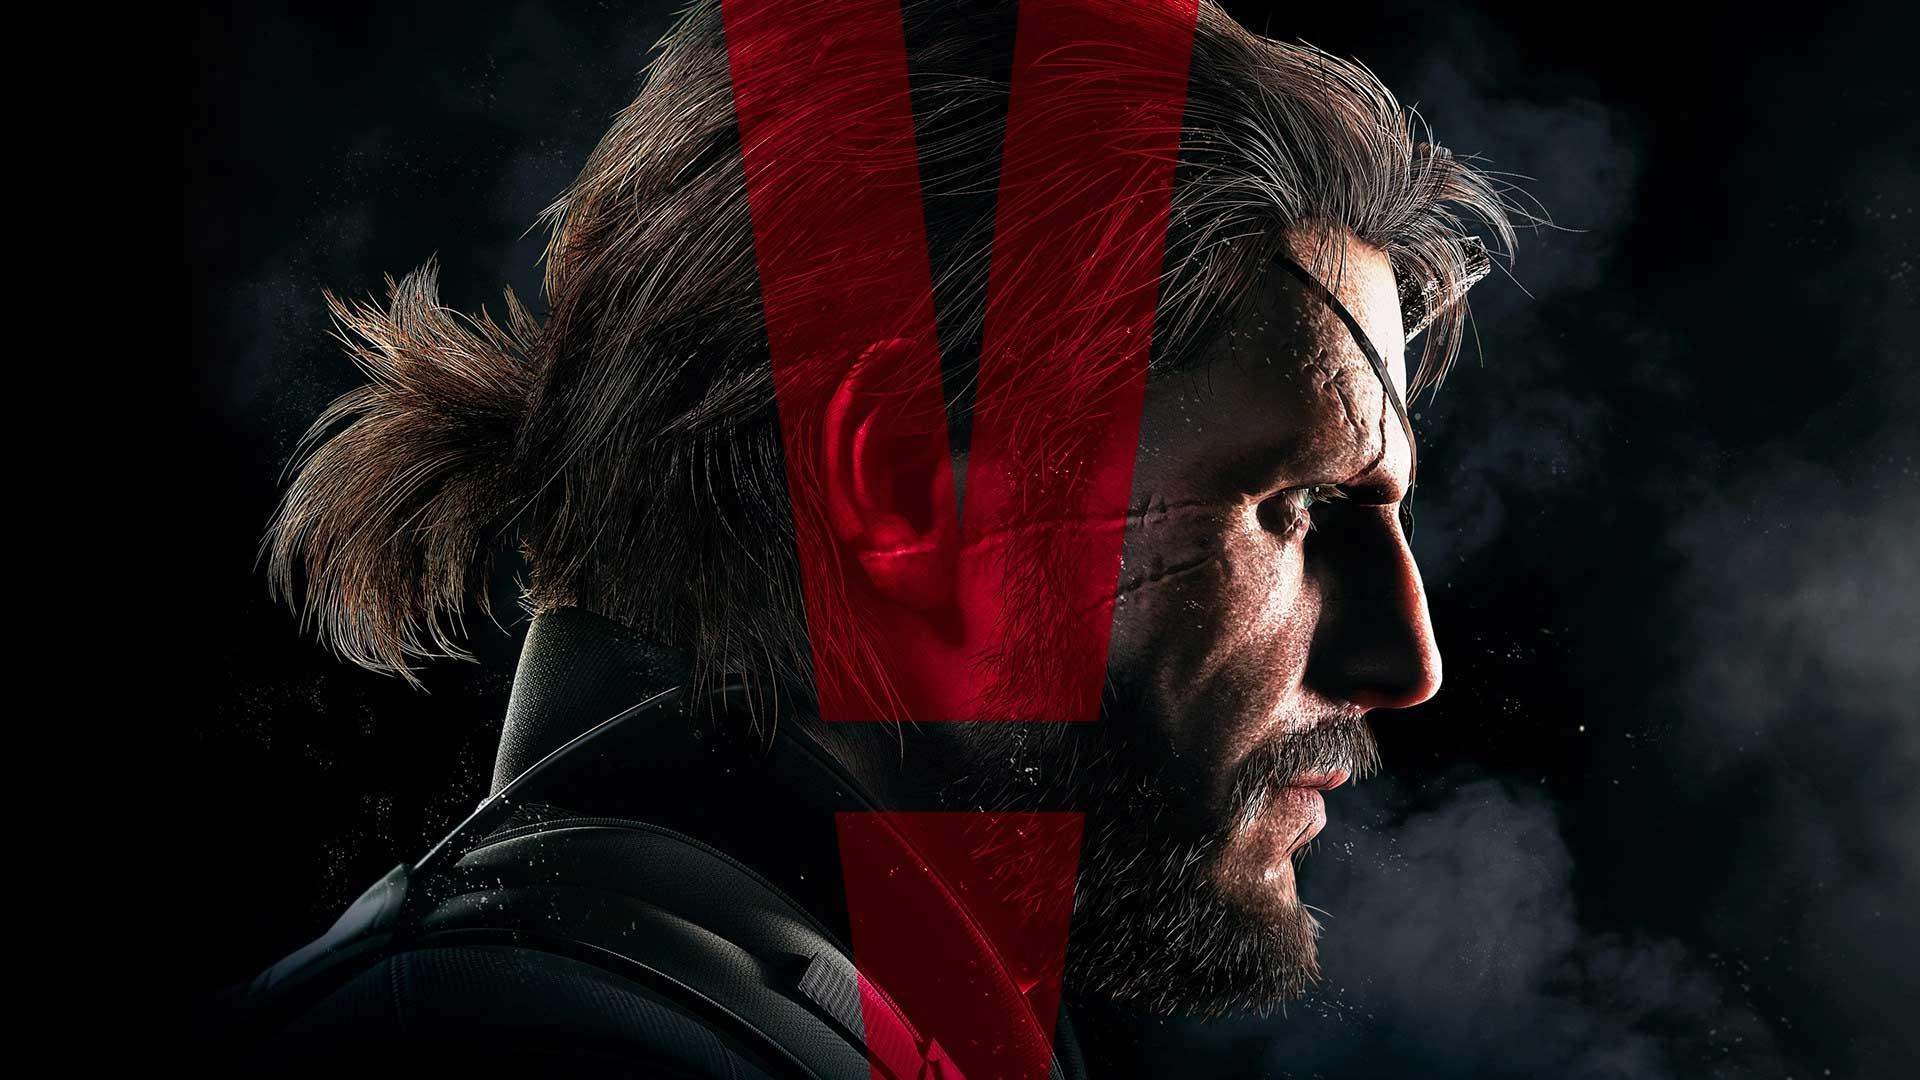 Metal Gear Solid V: Призрачная боль